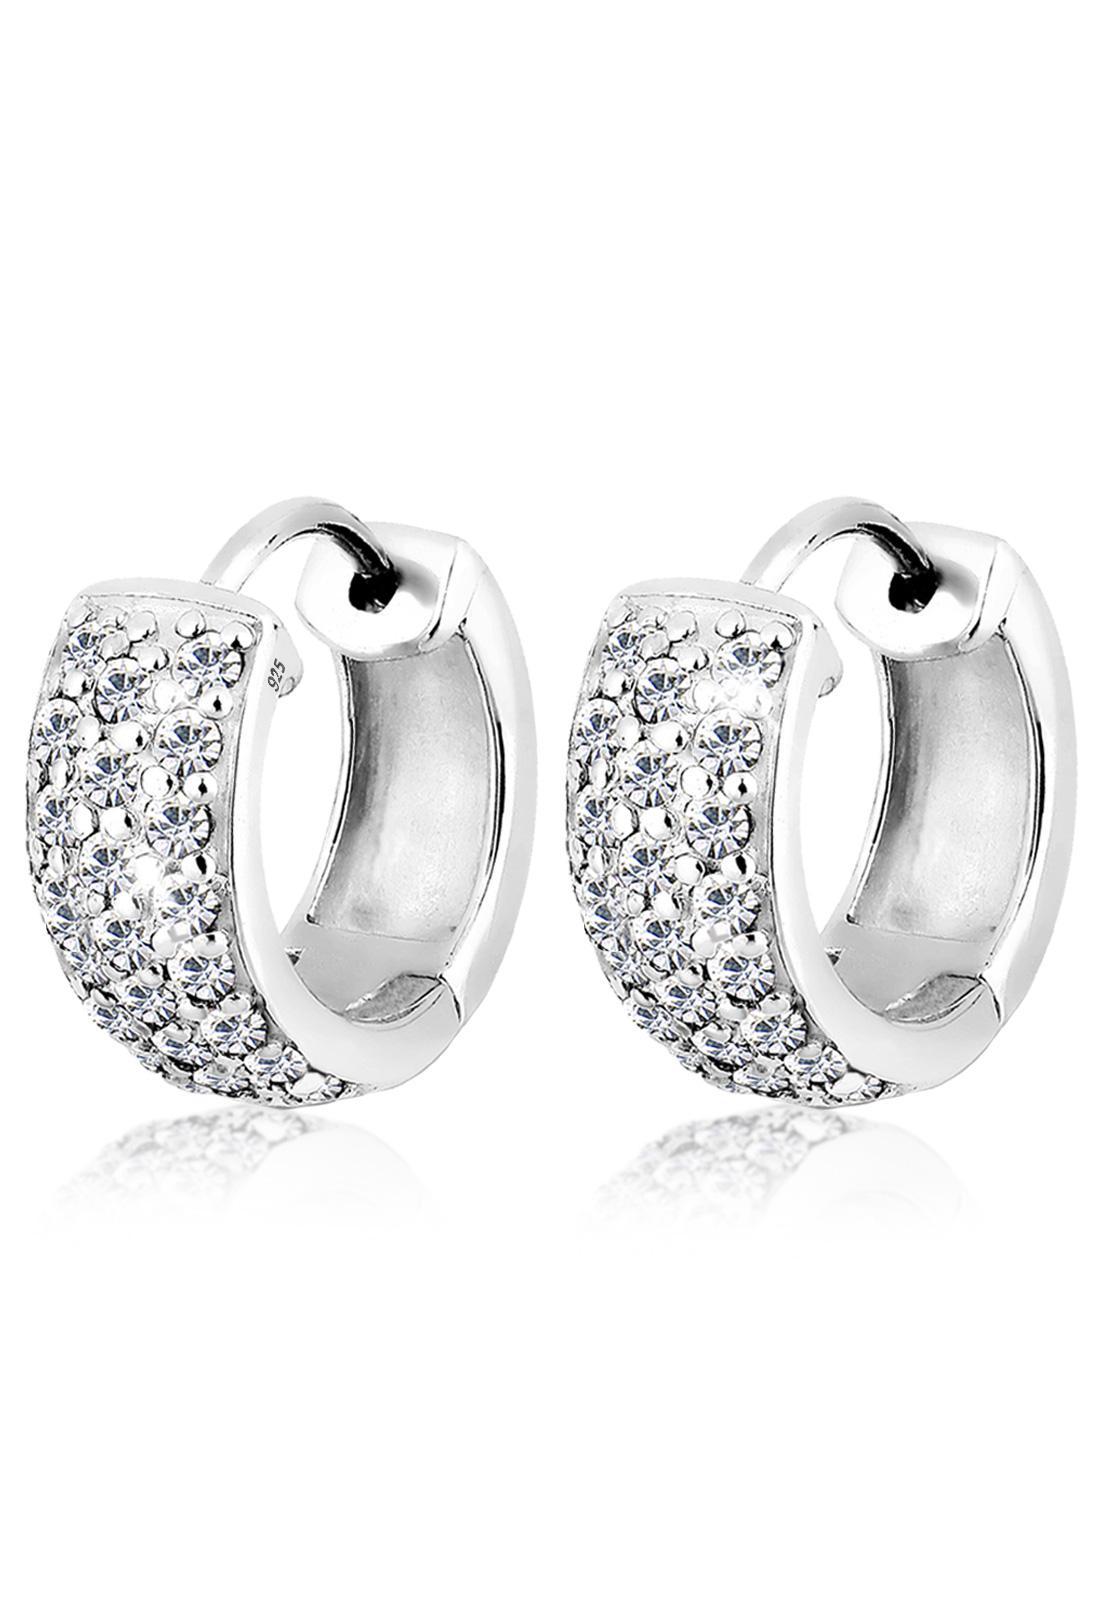 Elli Germany 925 Sterling Silver Anting Creol Glamor Swarovski® Crystals Silver